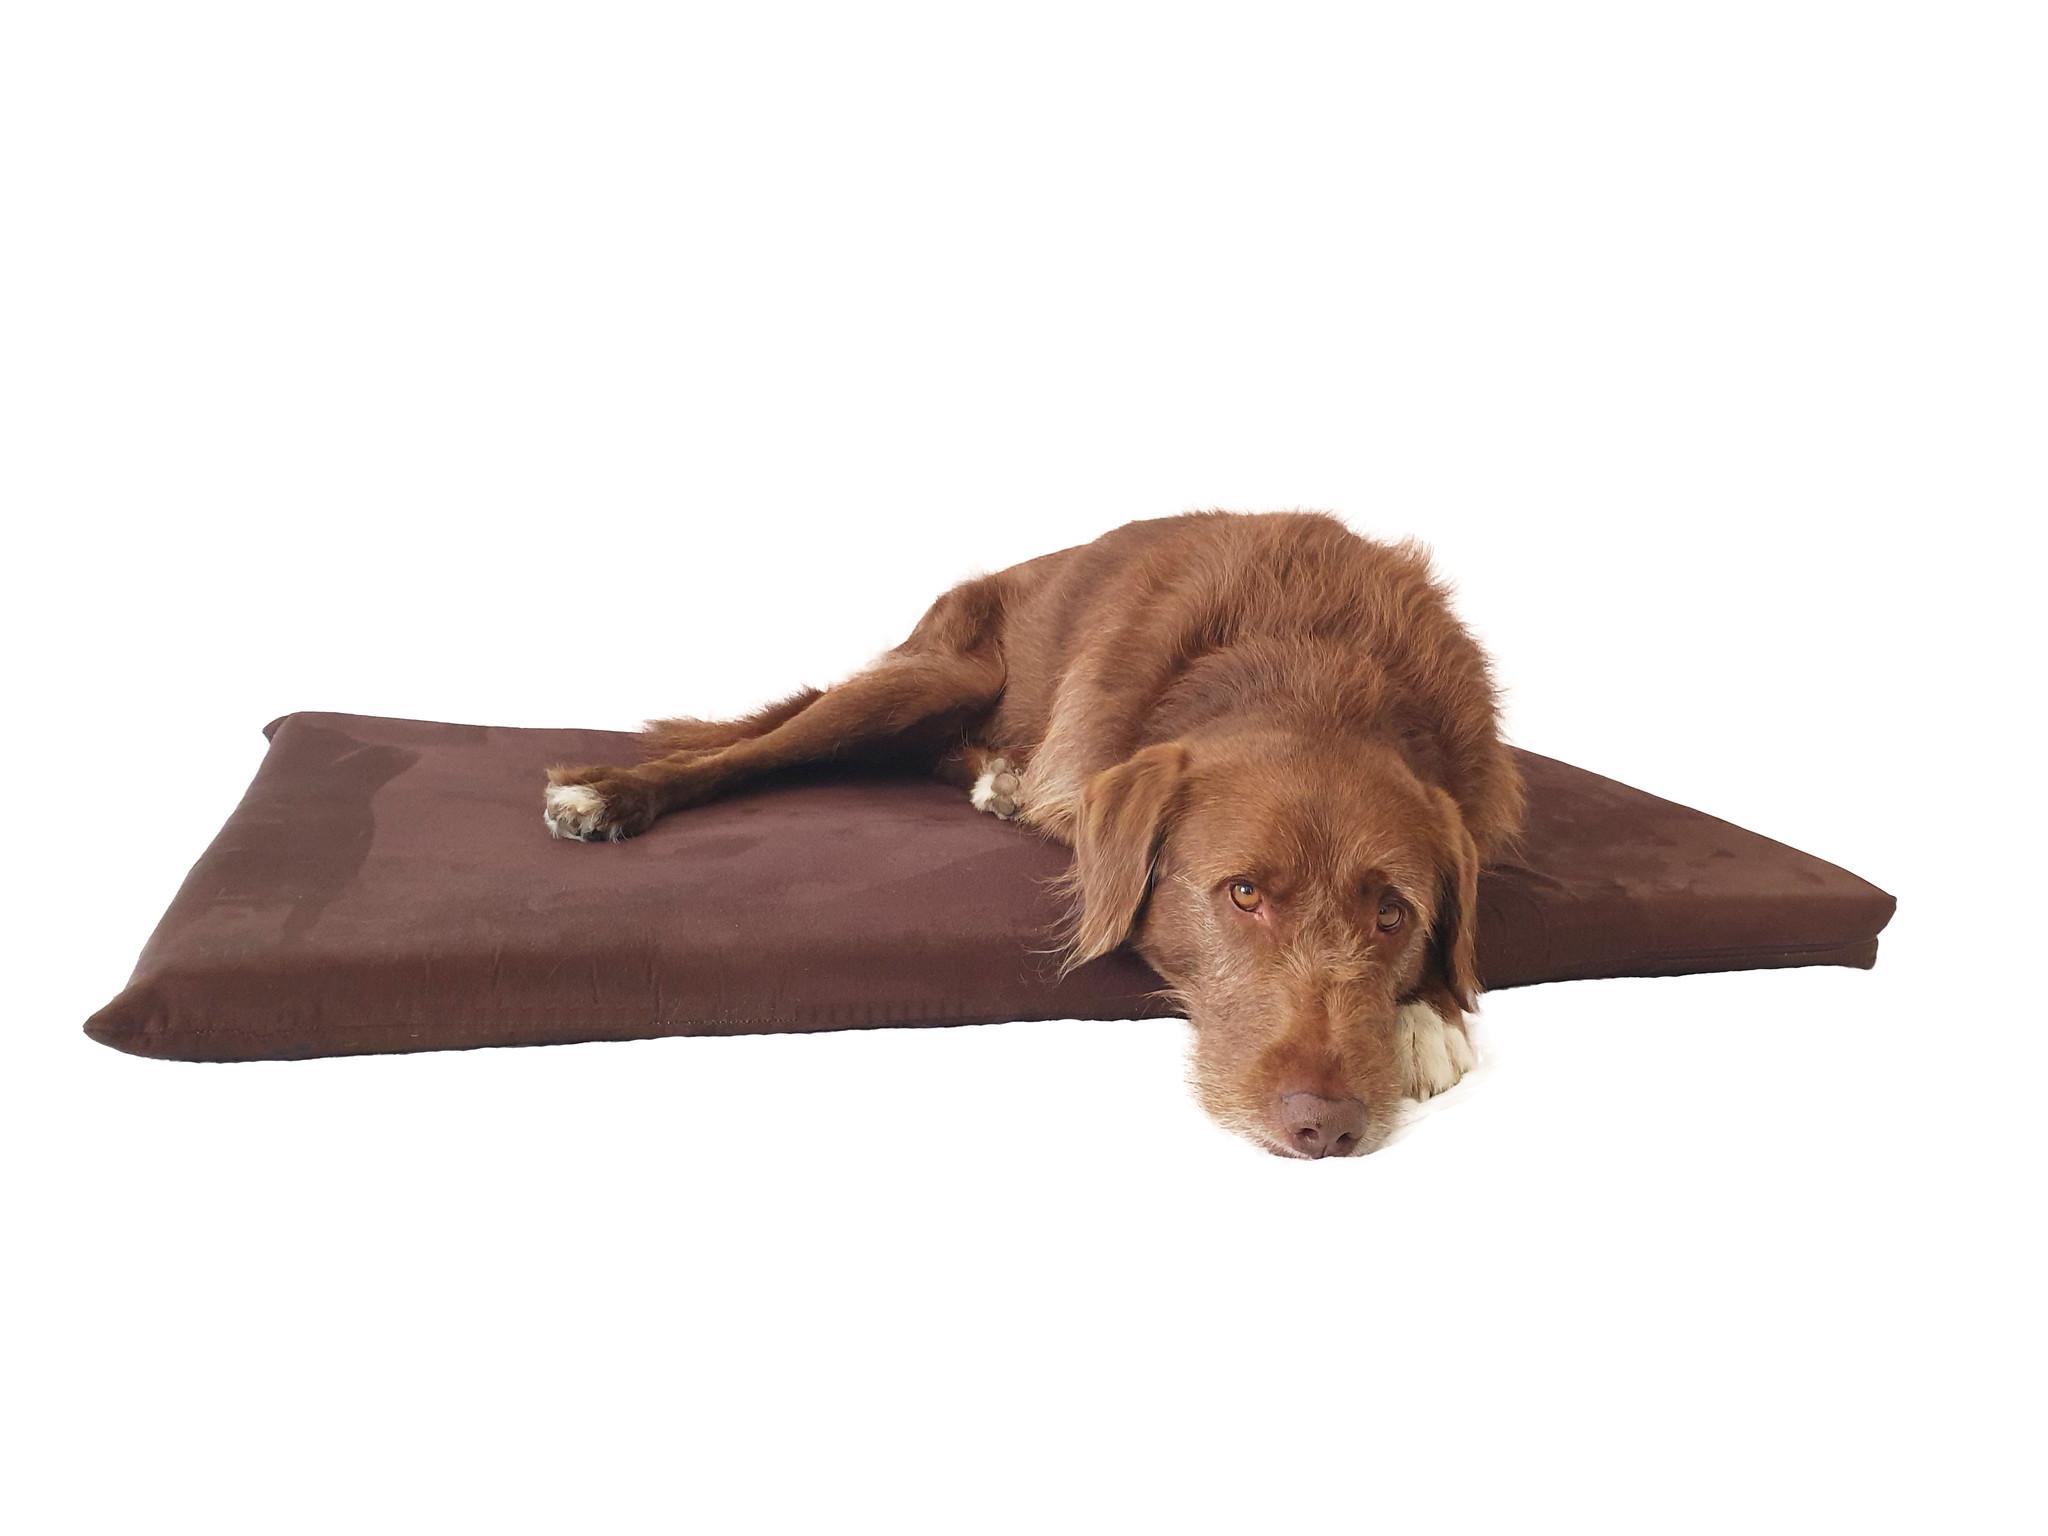 Ersatzbezug Alcantara für gelenkschonende Hundematratze